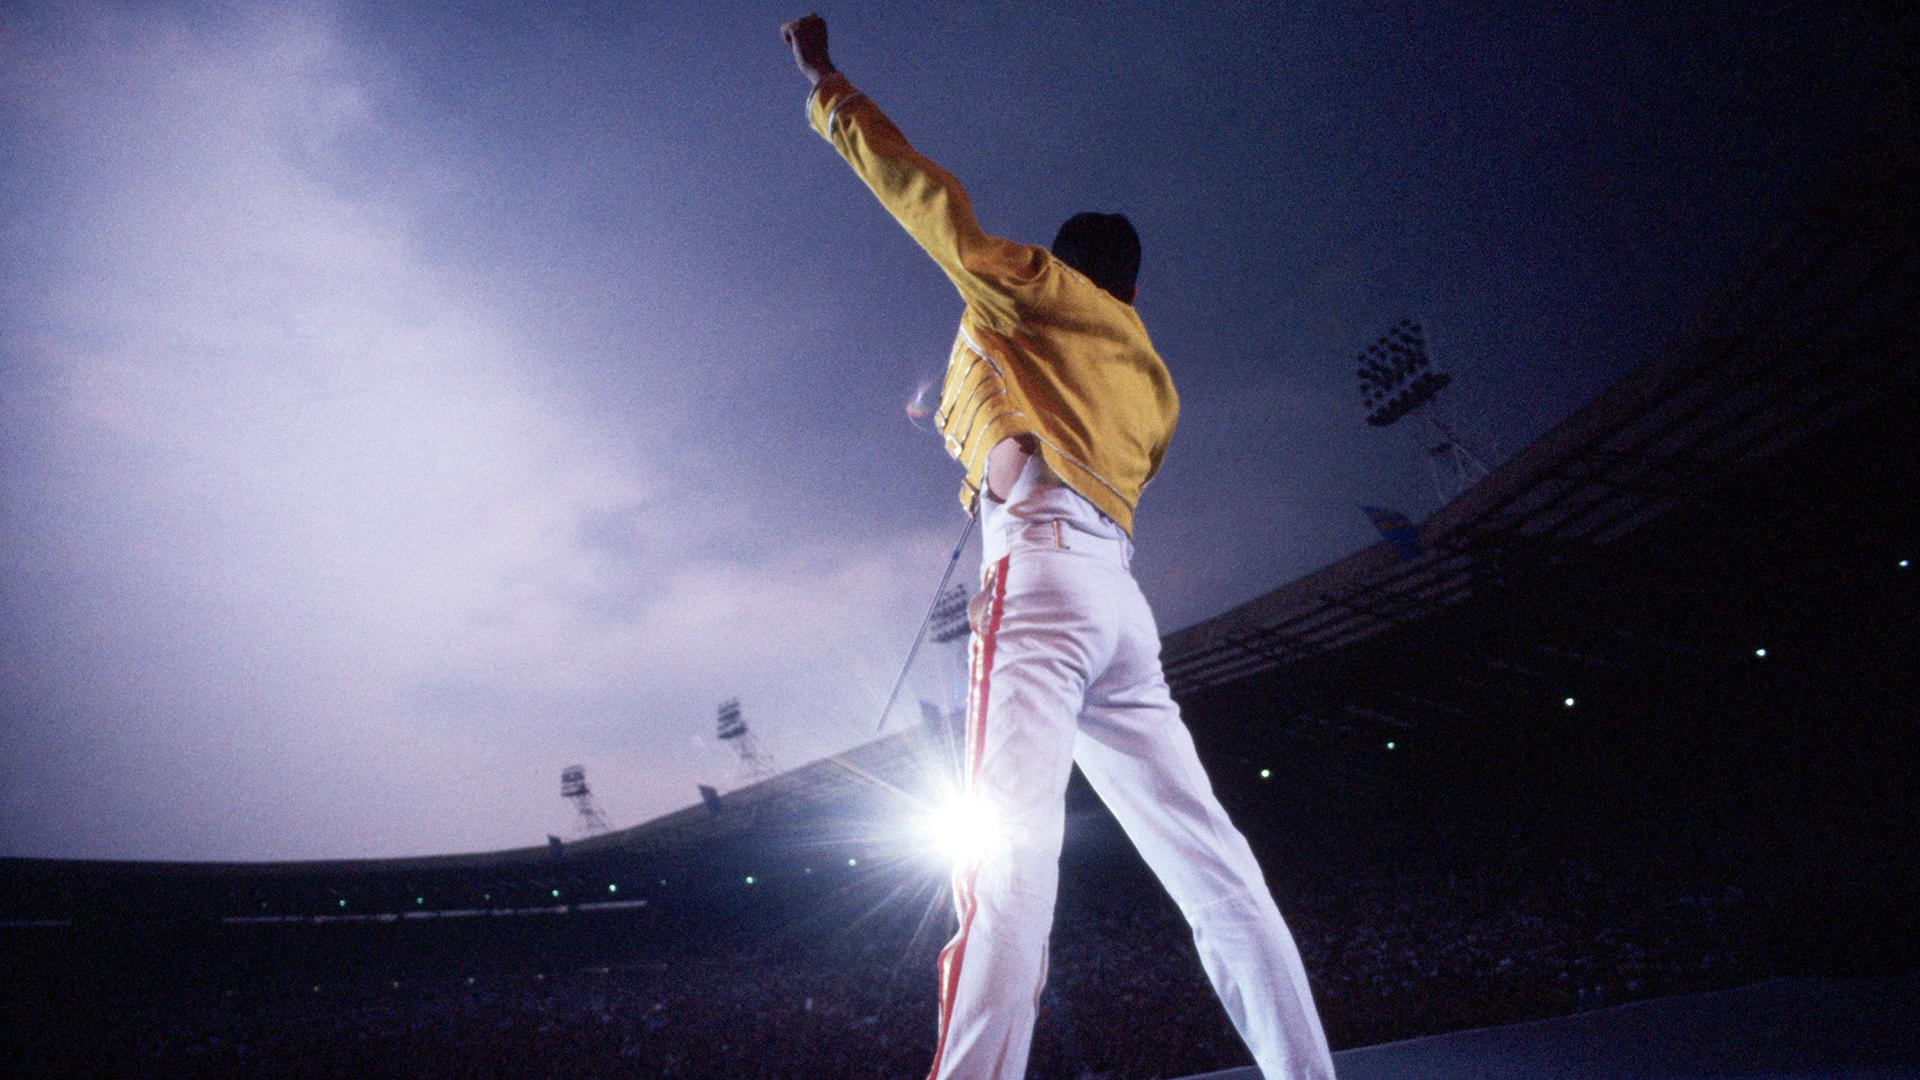 Freddie Mercury Wallpaper 1920x1080 Download Hd Wallpaper Wallpapertip